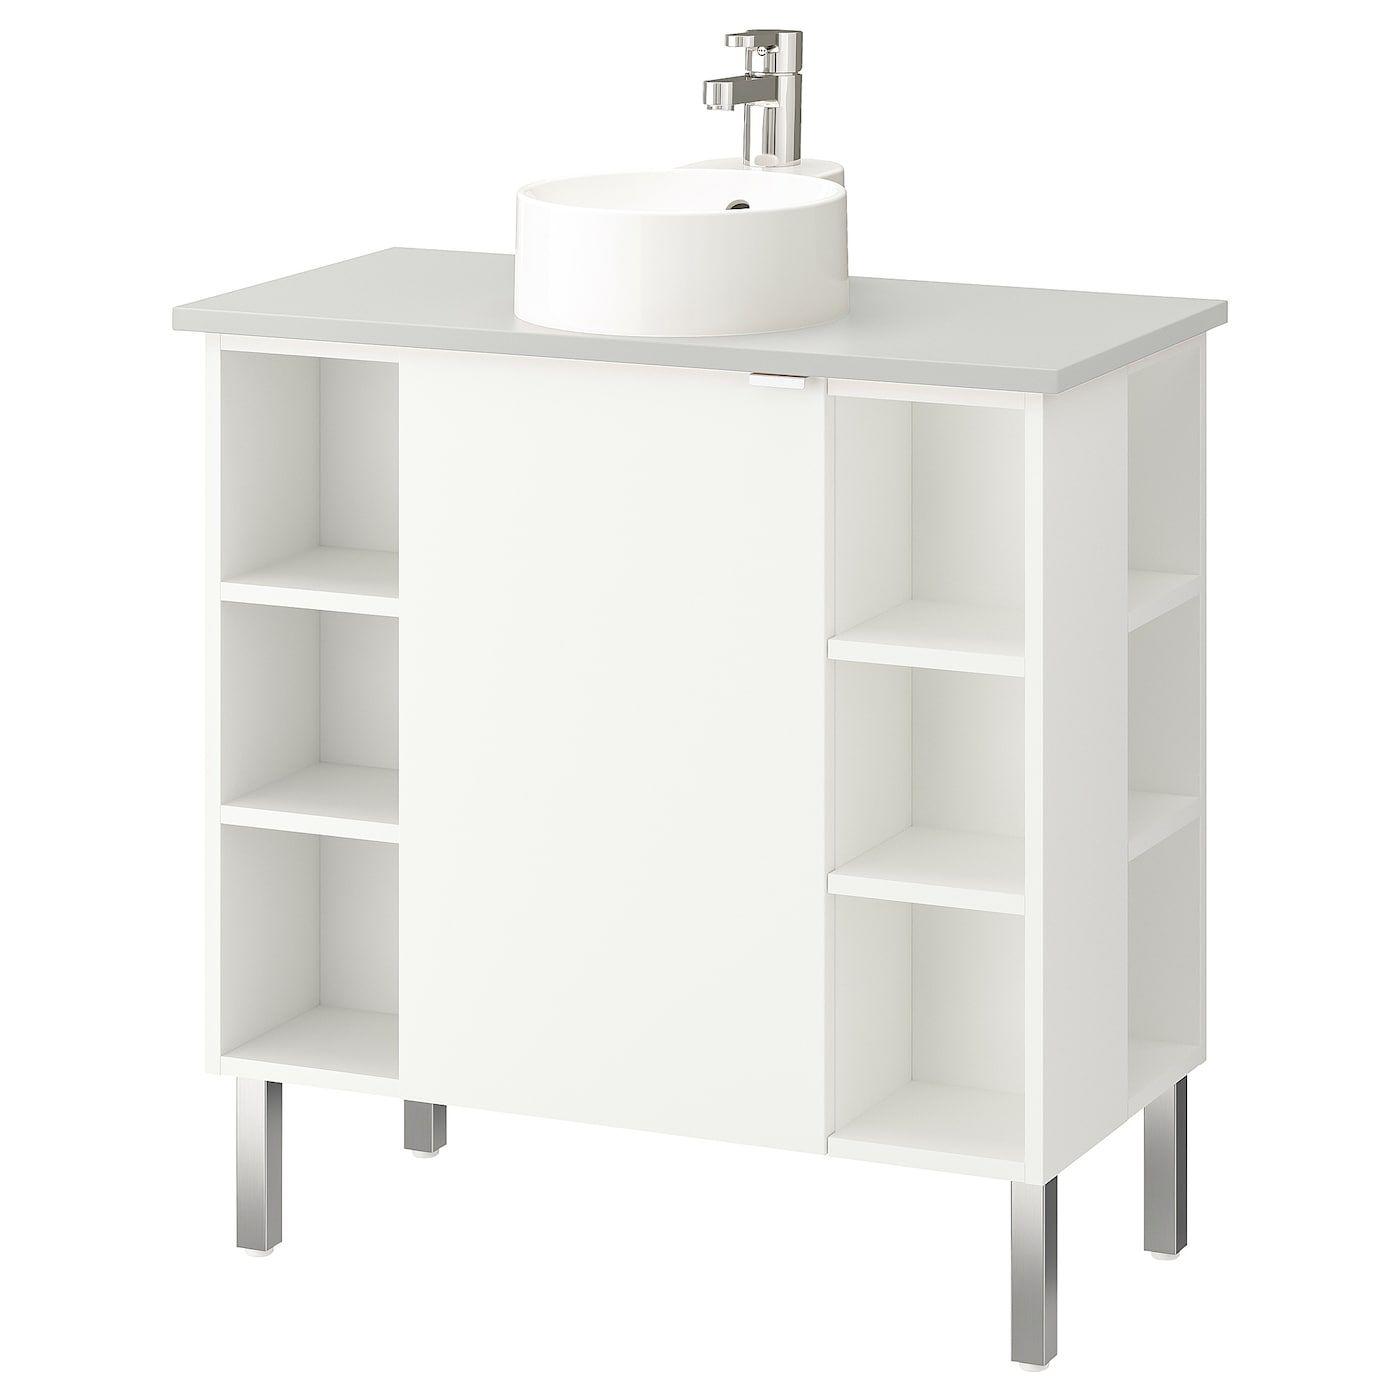 IKEA LILLÅNGEN/VISKAN / GUTVIKEN Bathroom vanity/1 door